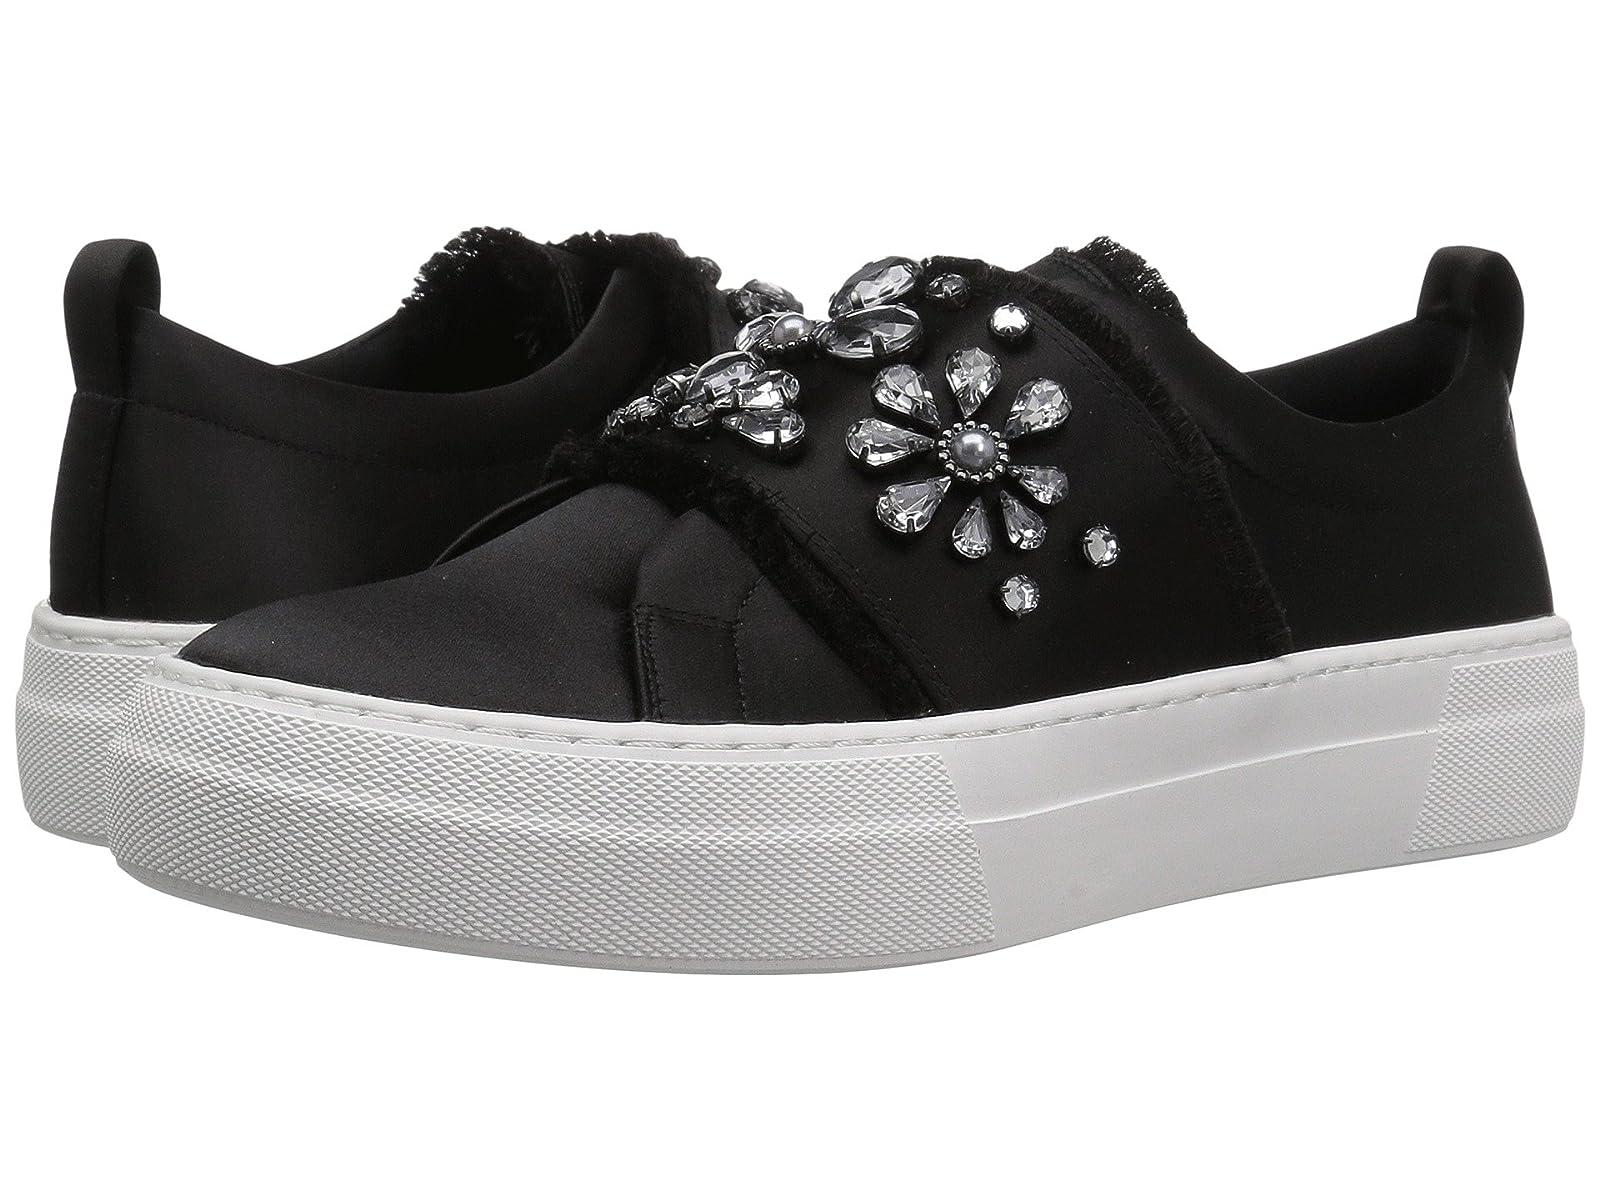 ALDO DreaclyaCheap and distinctive eye-catching shoes